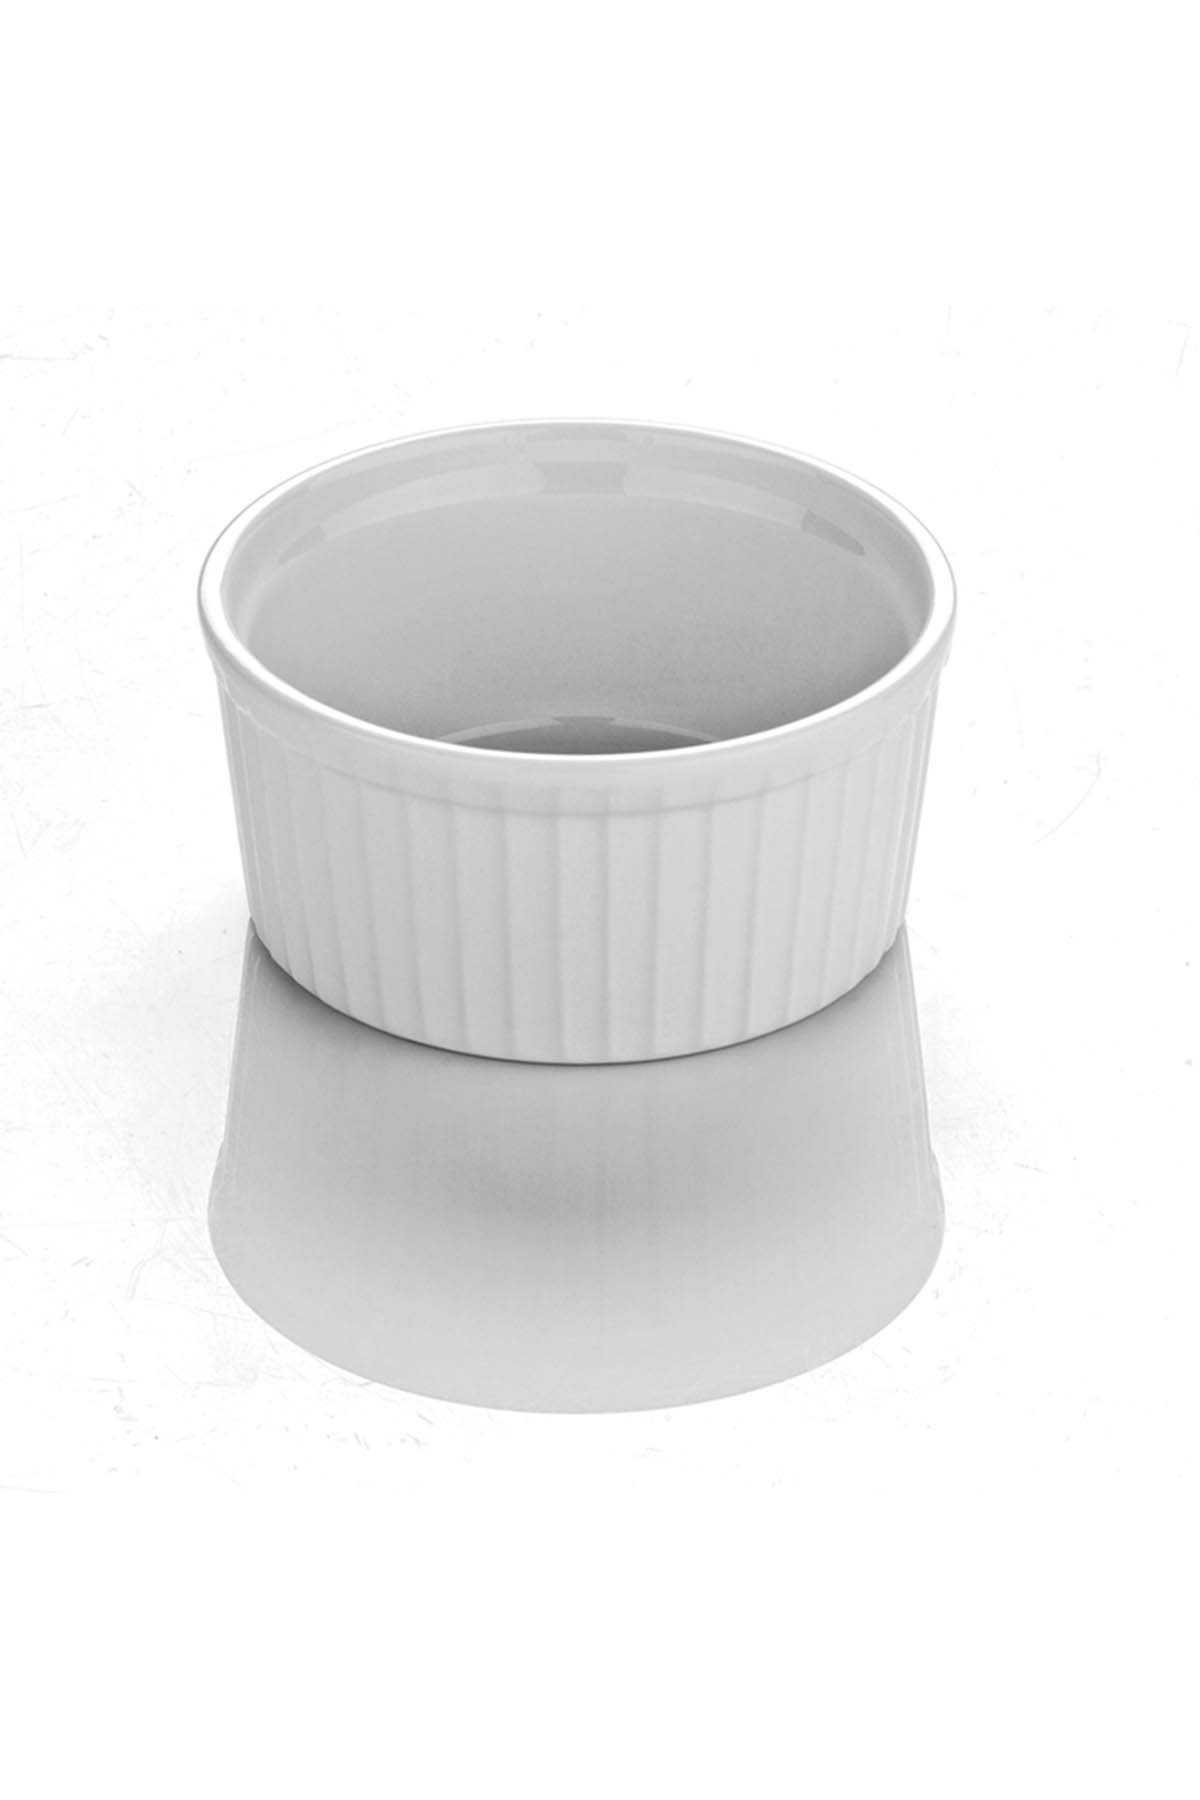 Kütahya Porselen 9 cm Sufle Kasesi